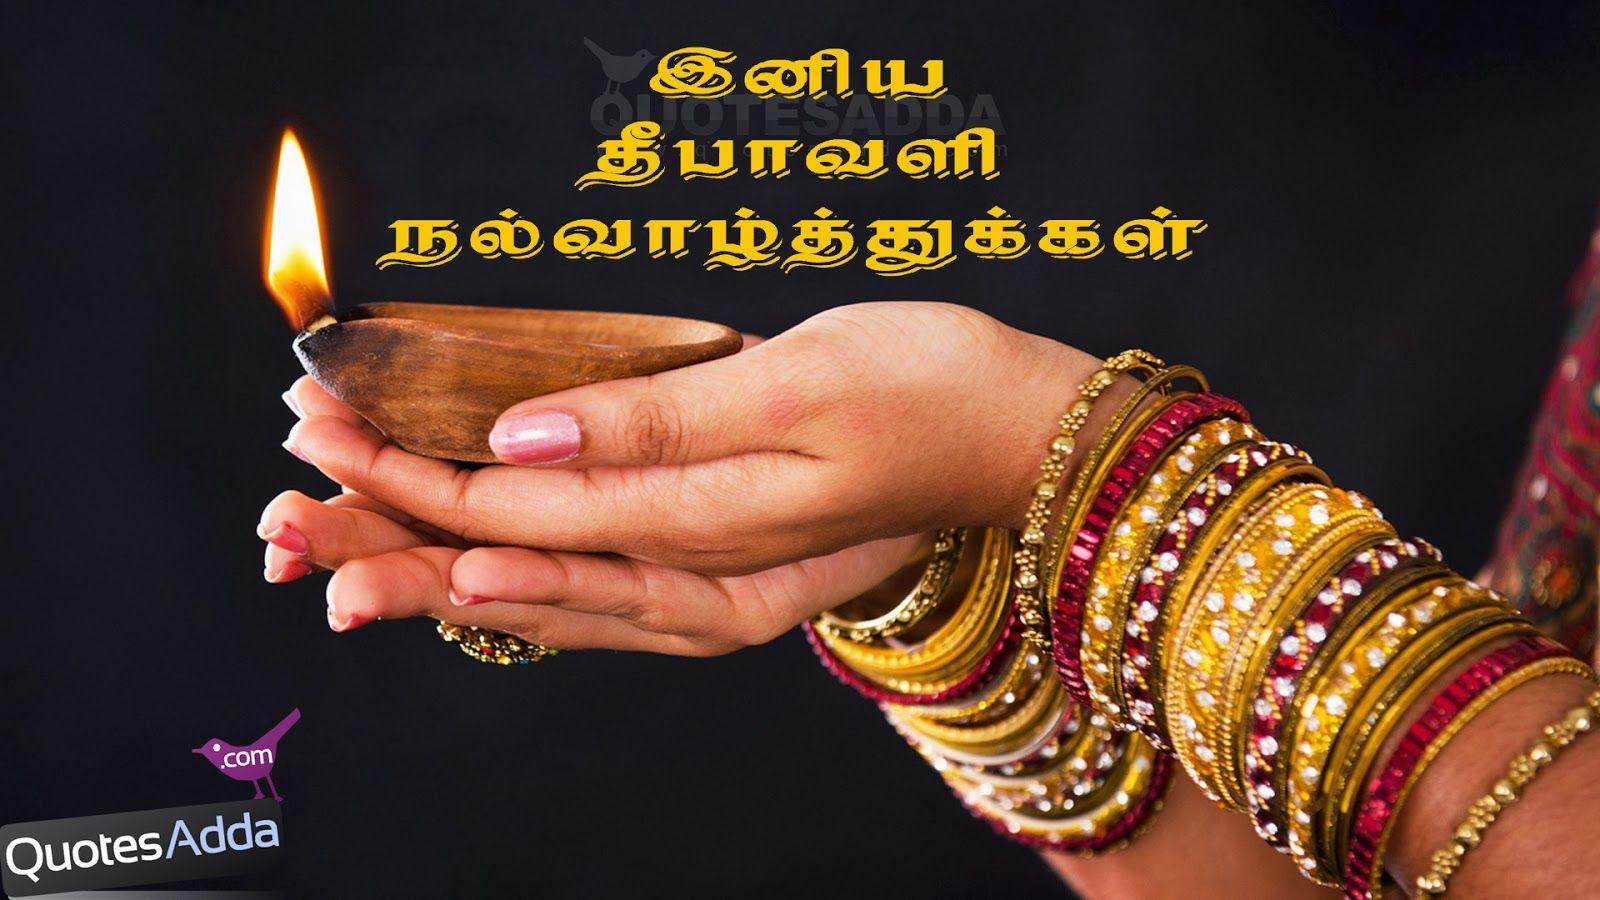 adda telugu quotes tamil quotes hindi quotes english ...